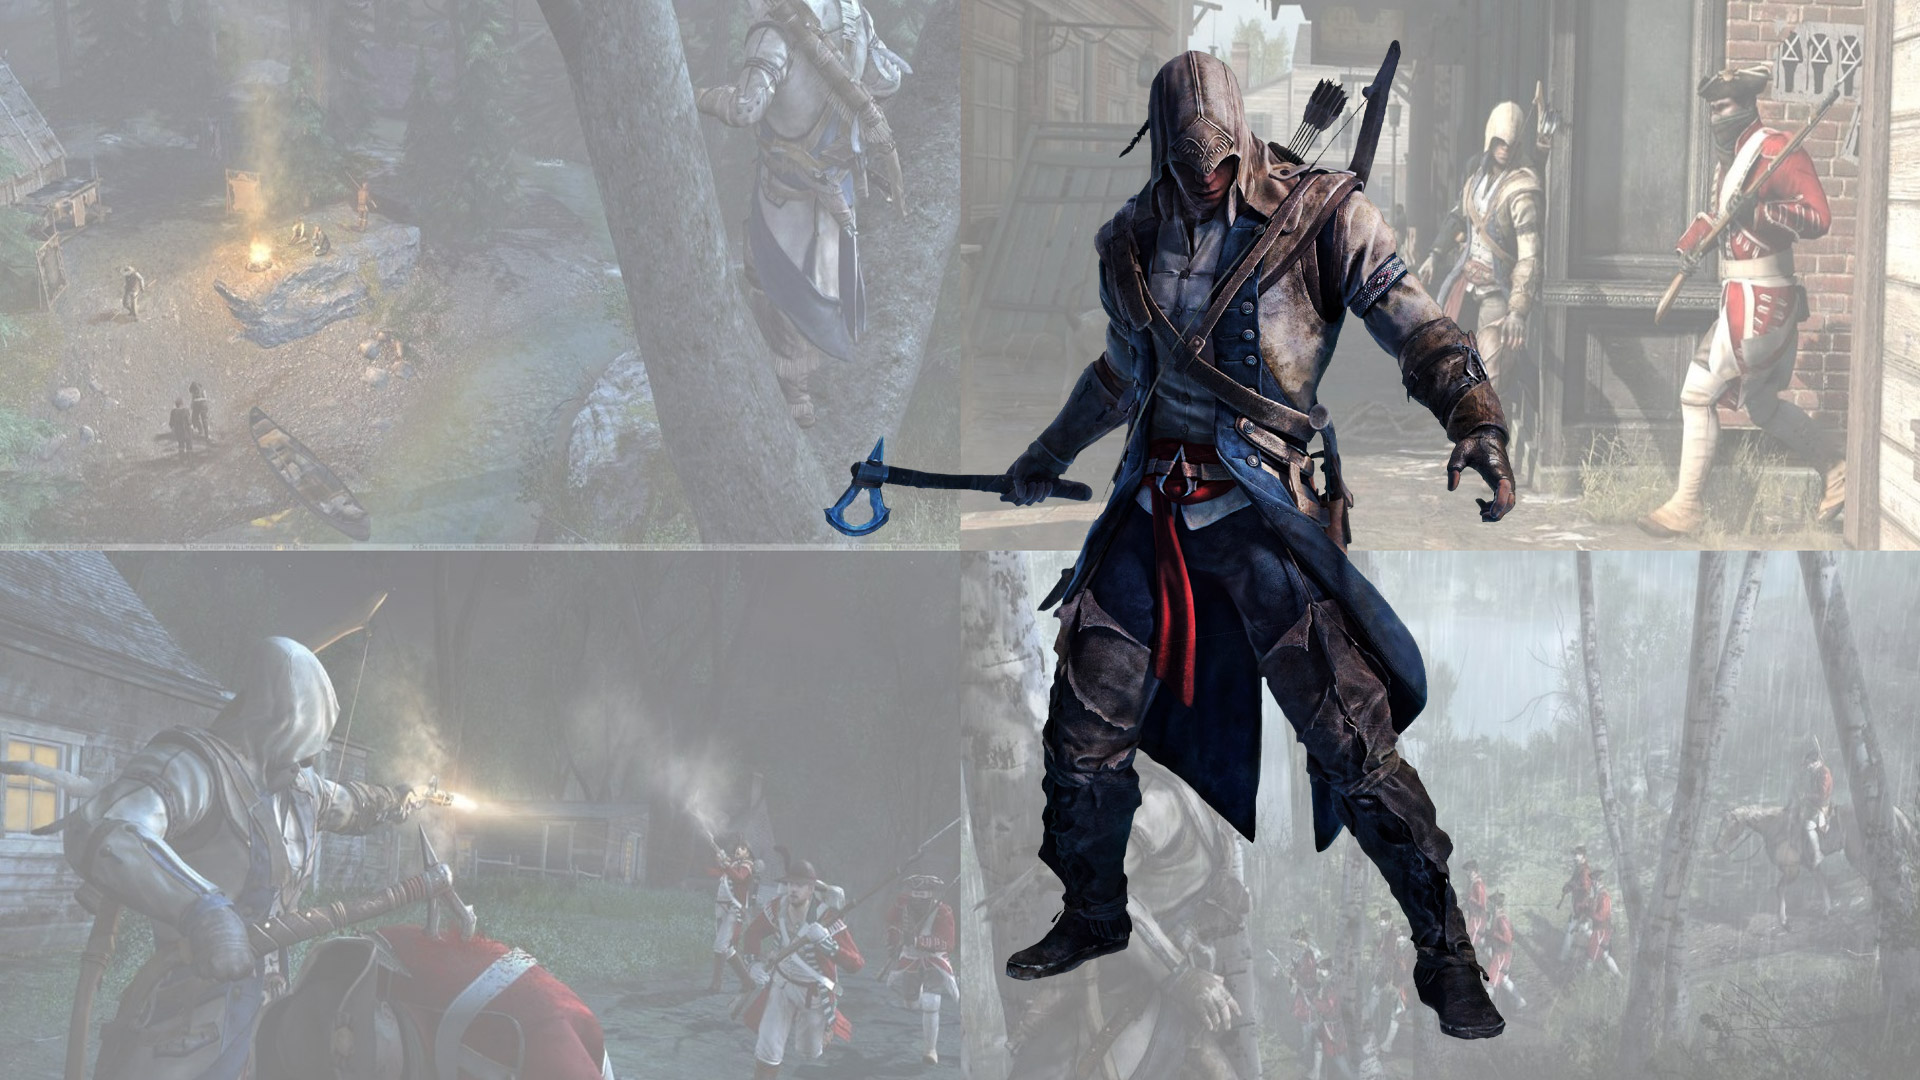 Assassin's Creed III Wallpaper in 1920x1080